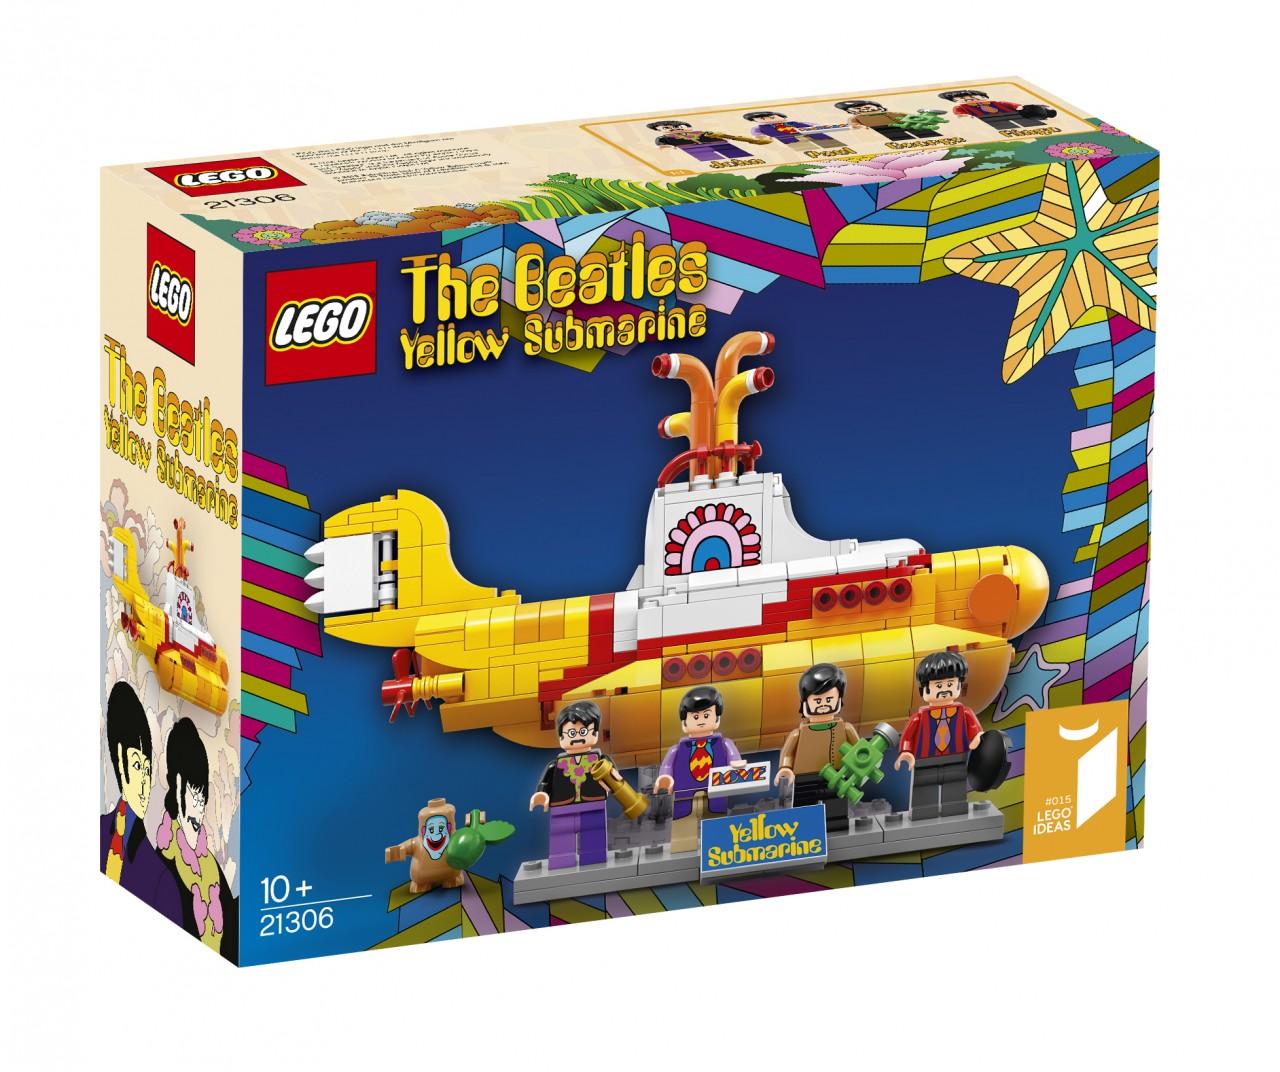 lego-yellow-submarine-the-beatles-3-1280x1072